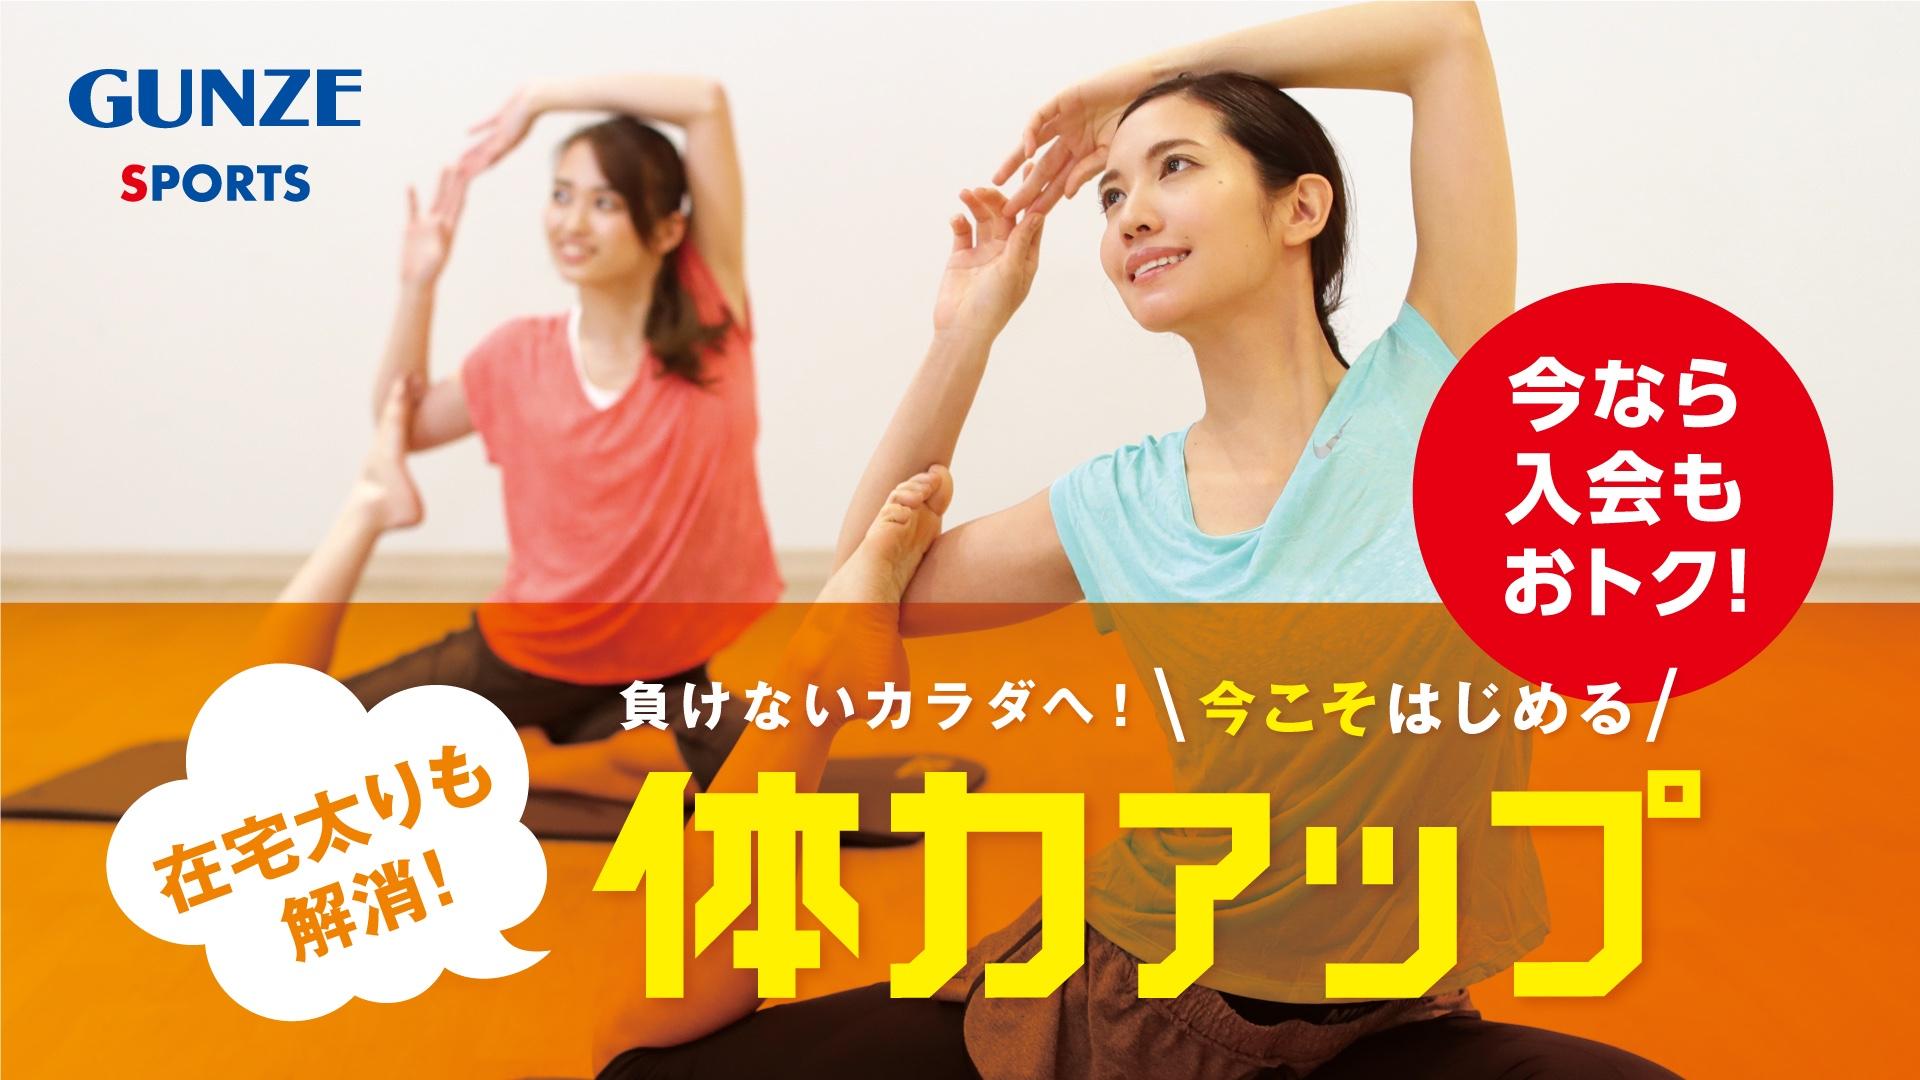 Gunzesports maebashi グンゼスポーツ 前橋